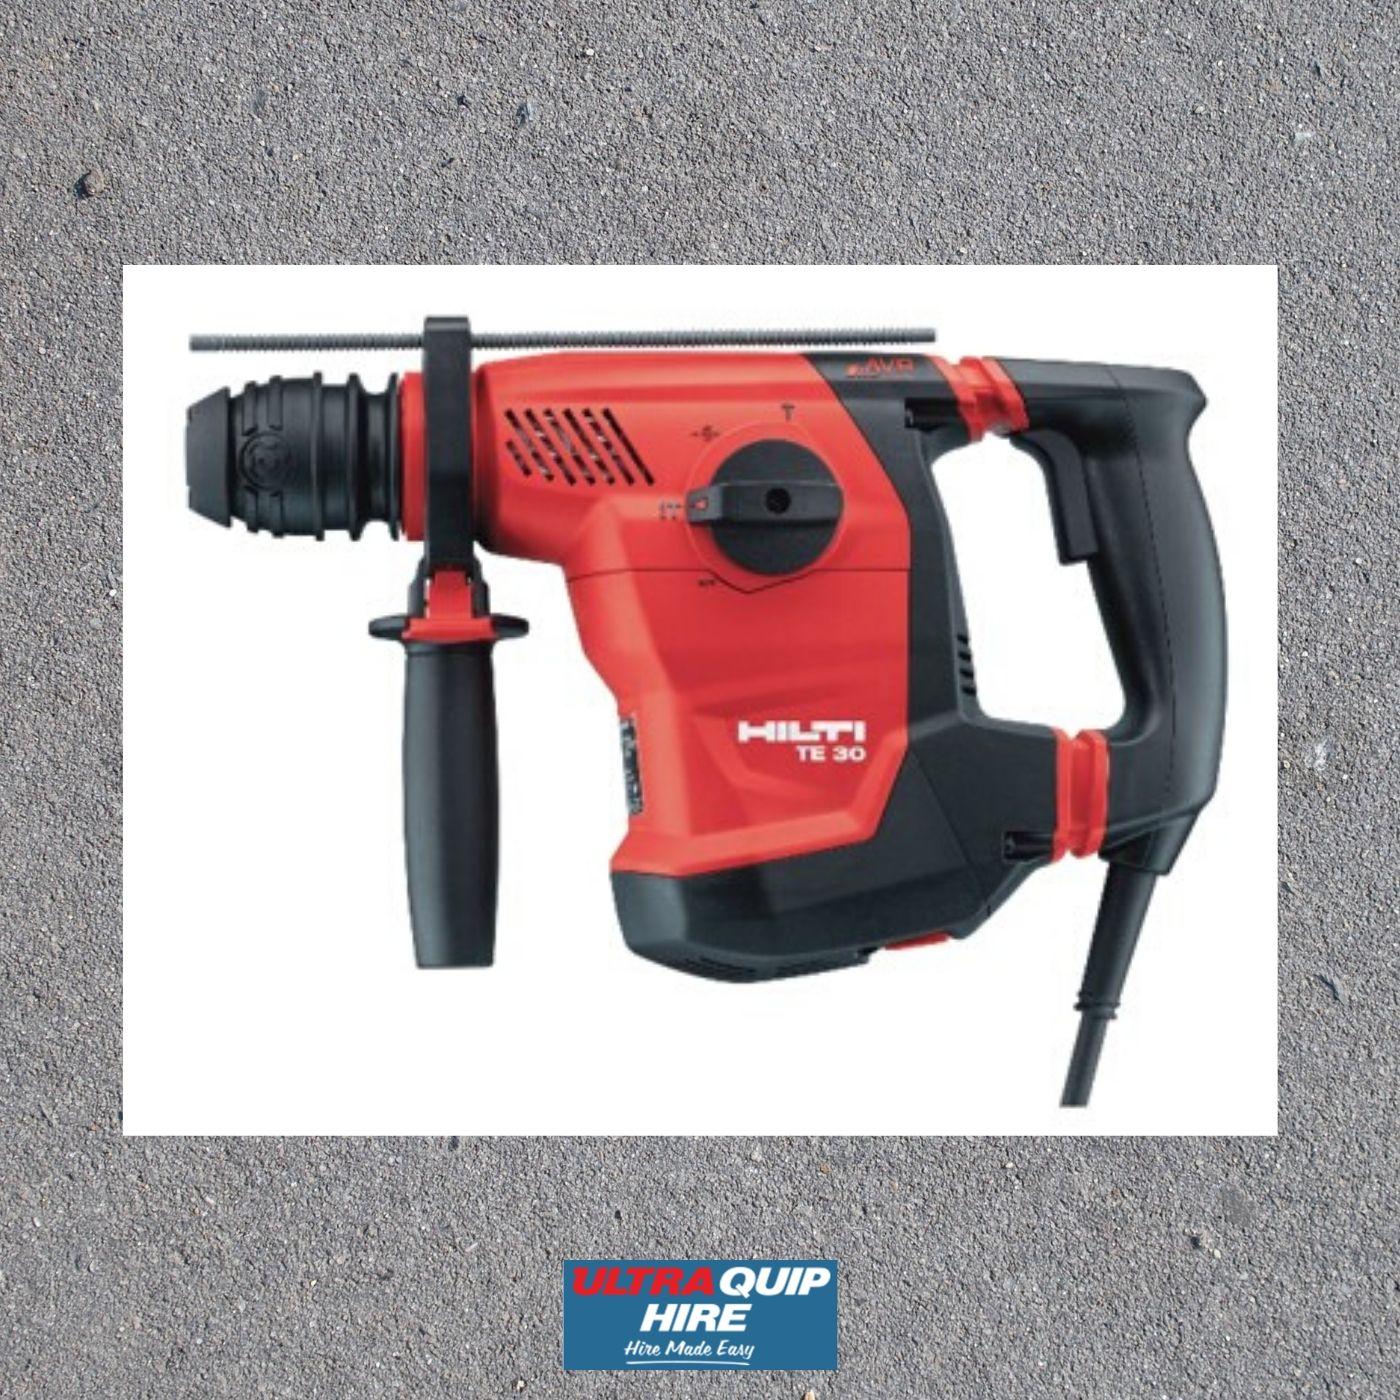 Ultraquip Hilti concrete demolition drill breaker hammer hire rent hirepool kennards